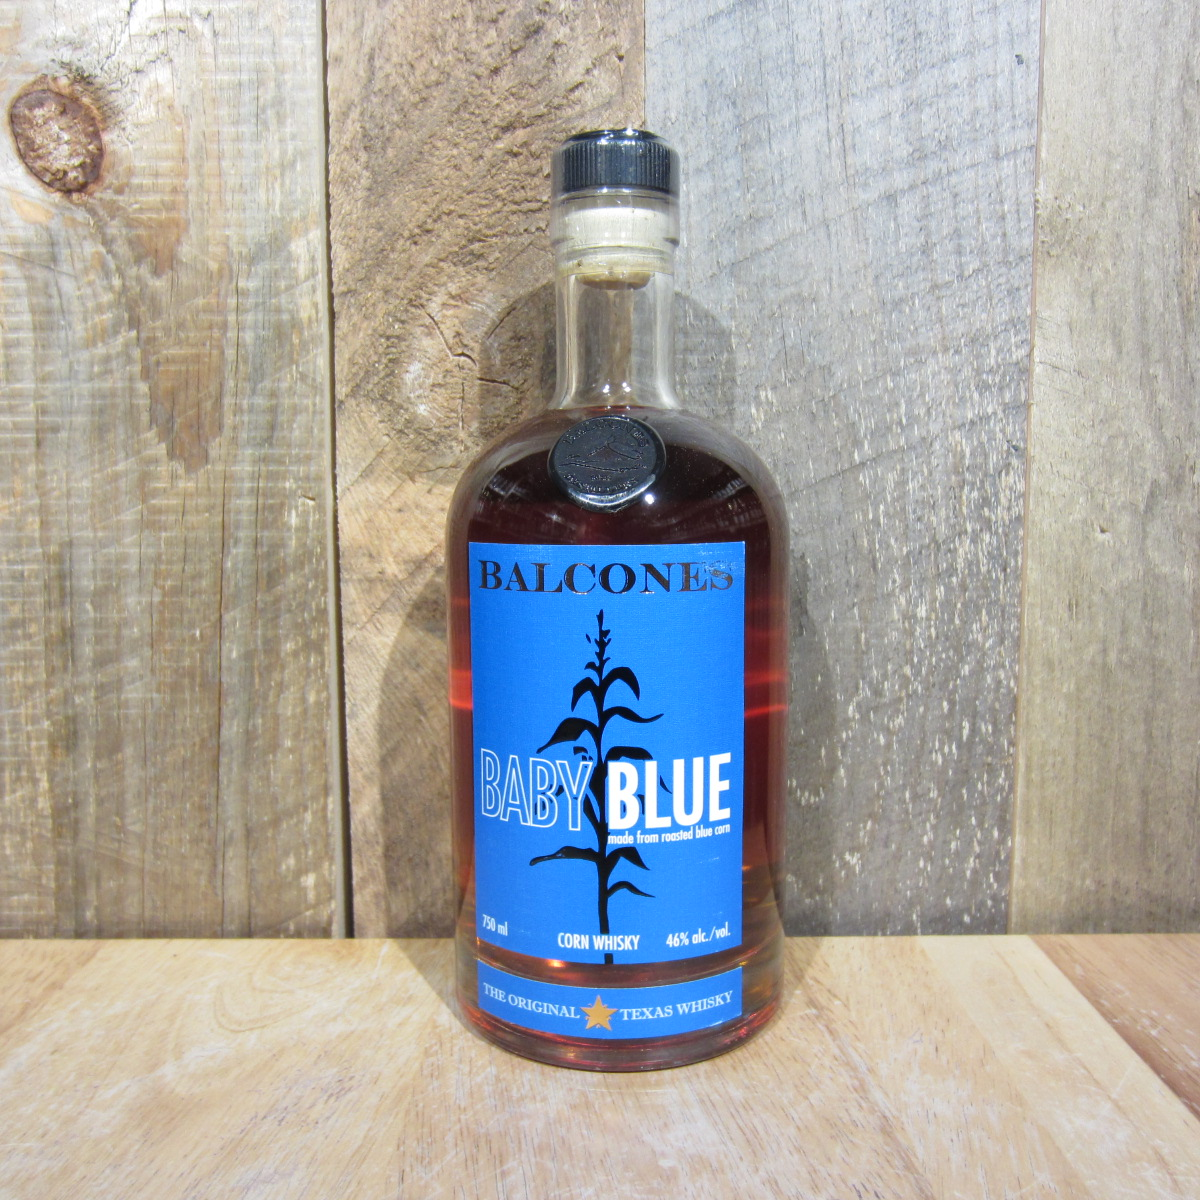 Balcones Baby Blue Corn Whisky 750ml